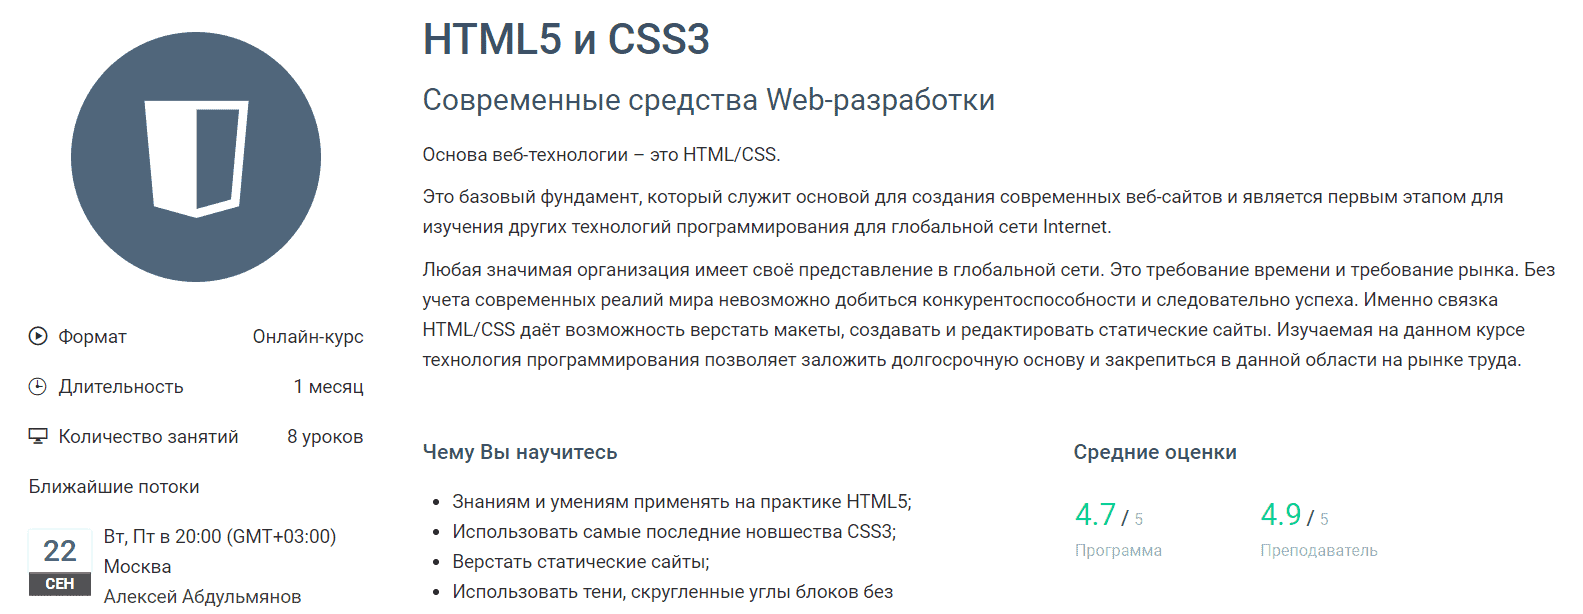 HTML5 и CSS3 от GeekBrains